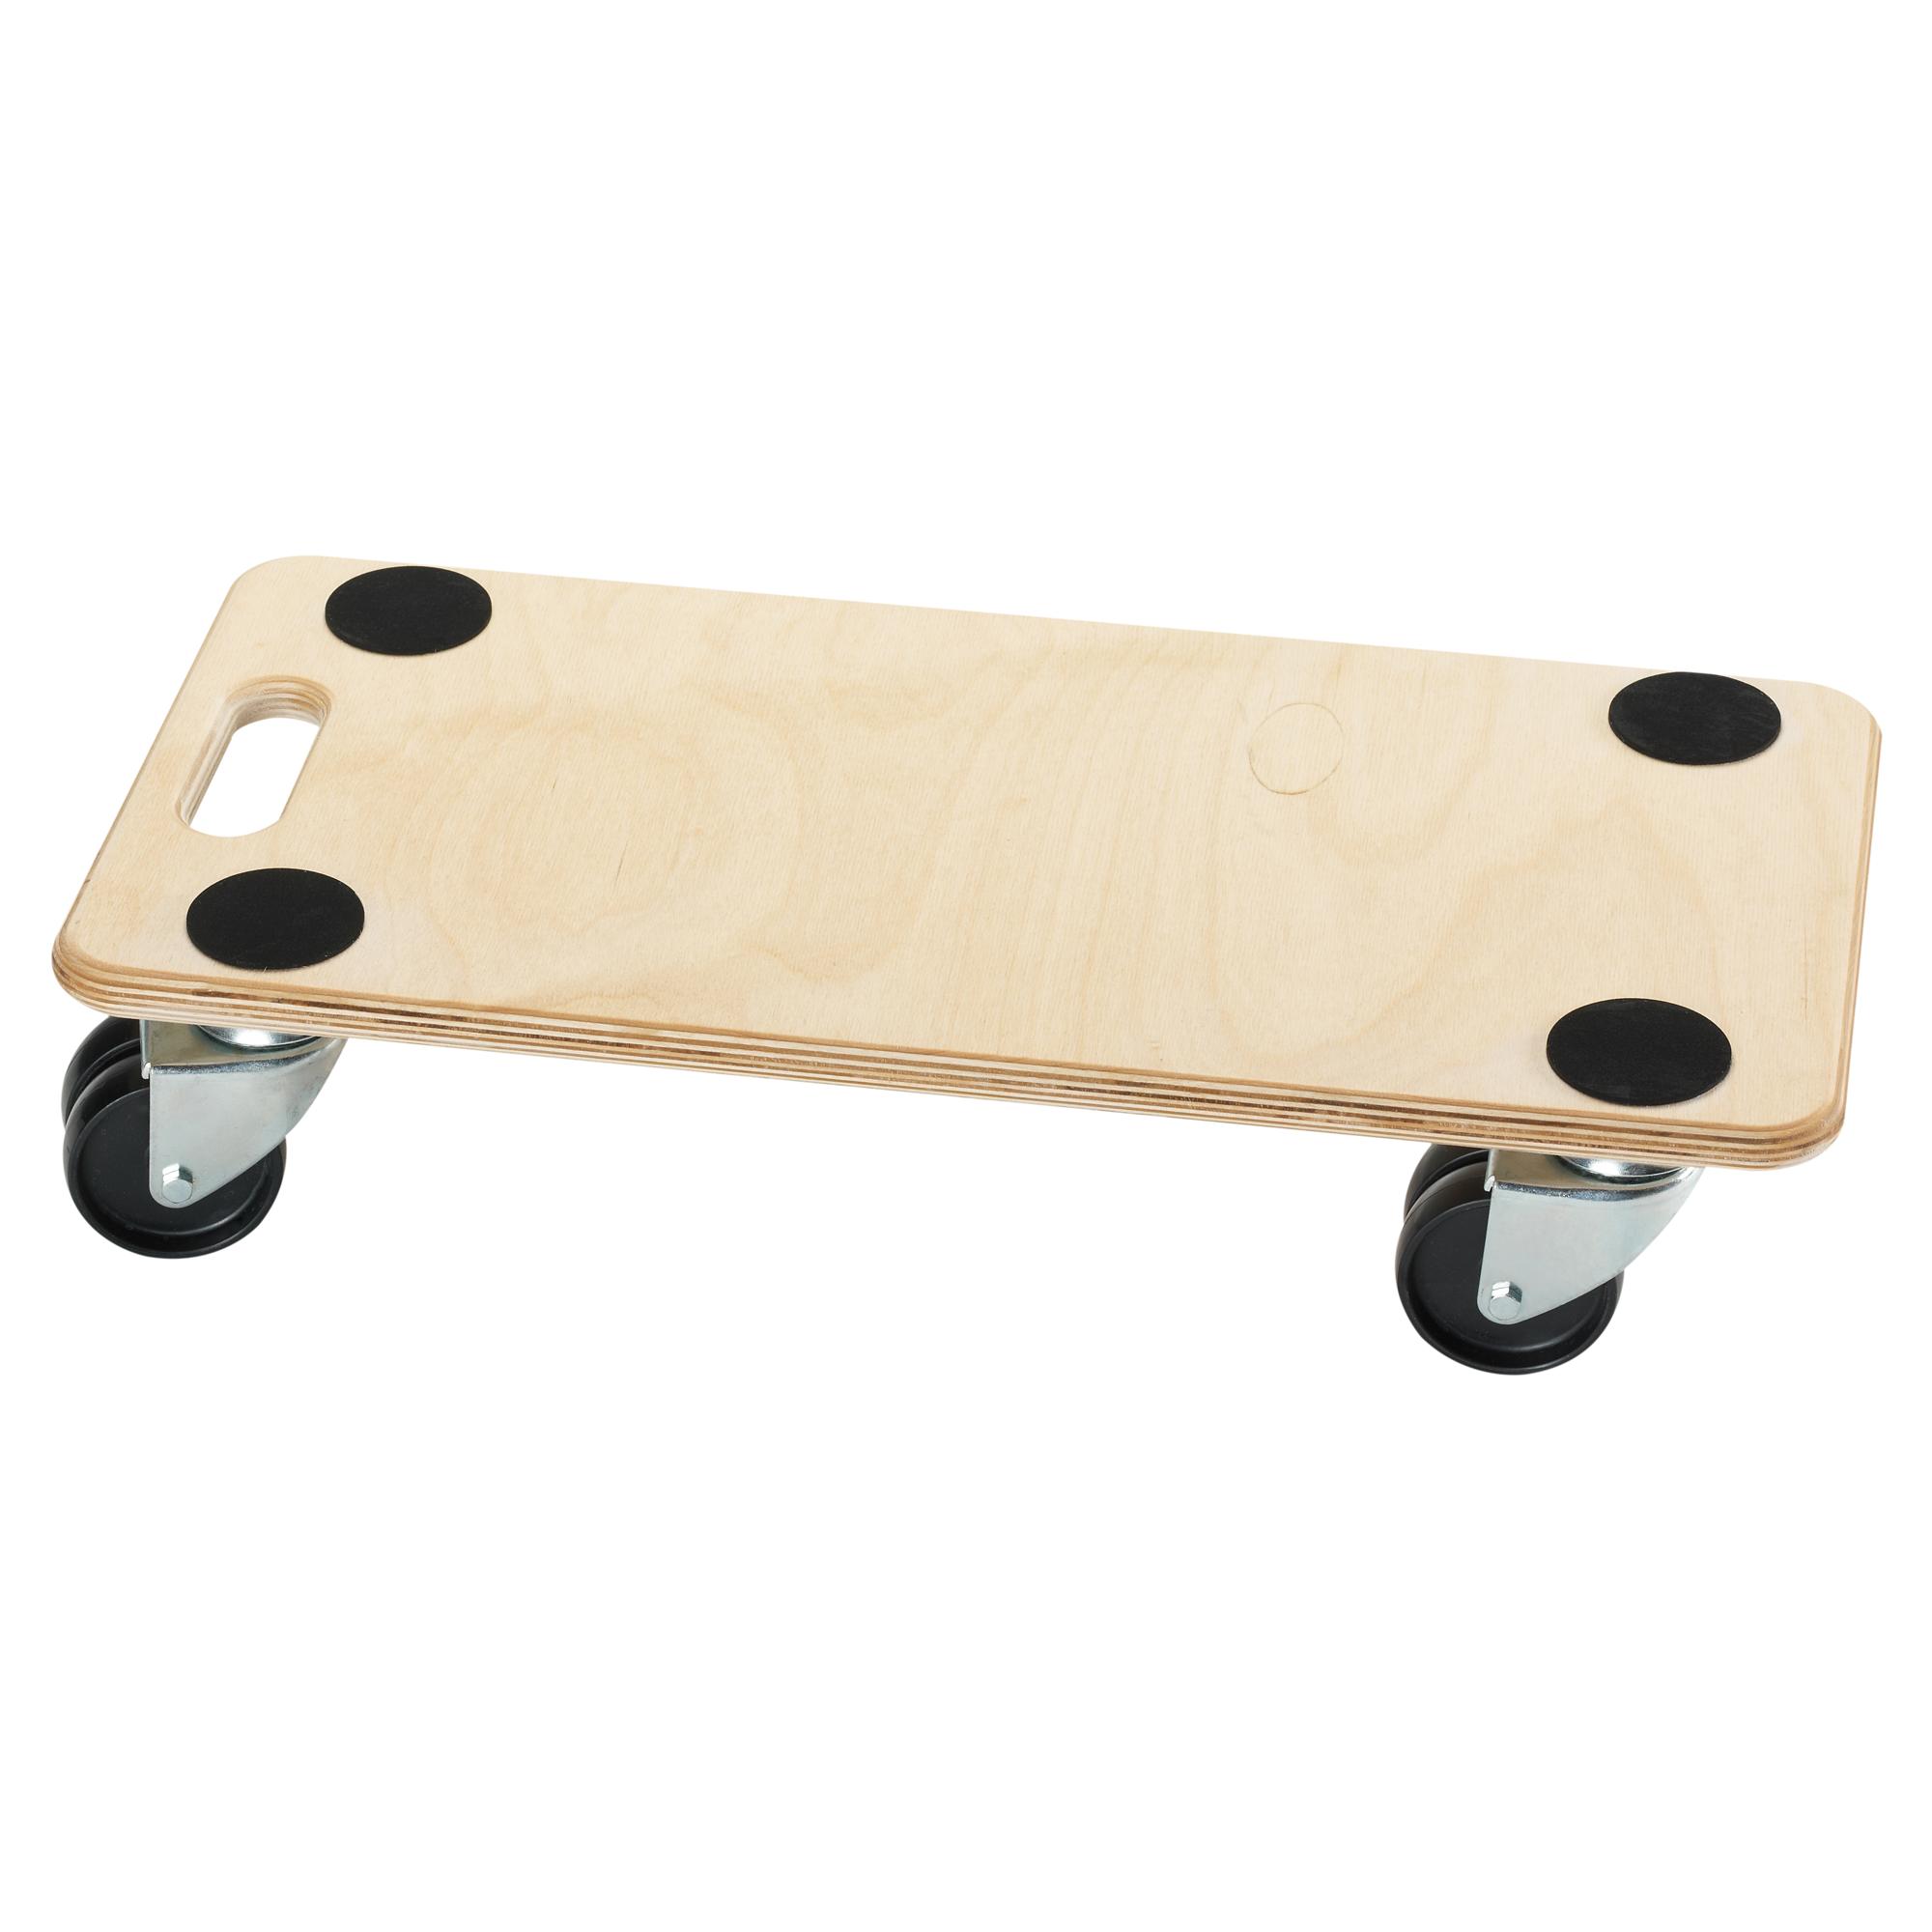 Möbelroller 29 X 13 X 59 Cm ǀ Toom Baumarkt